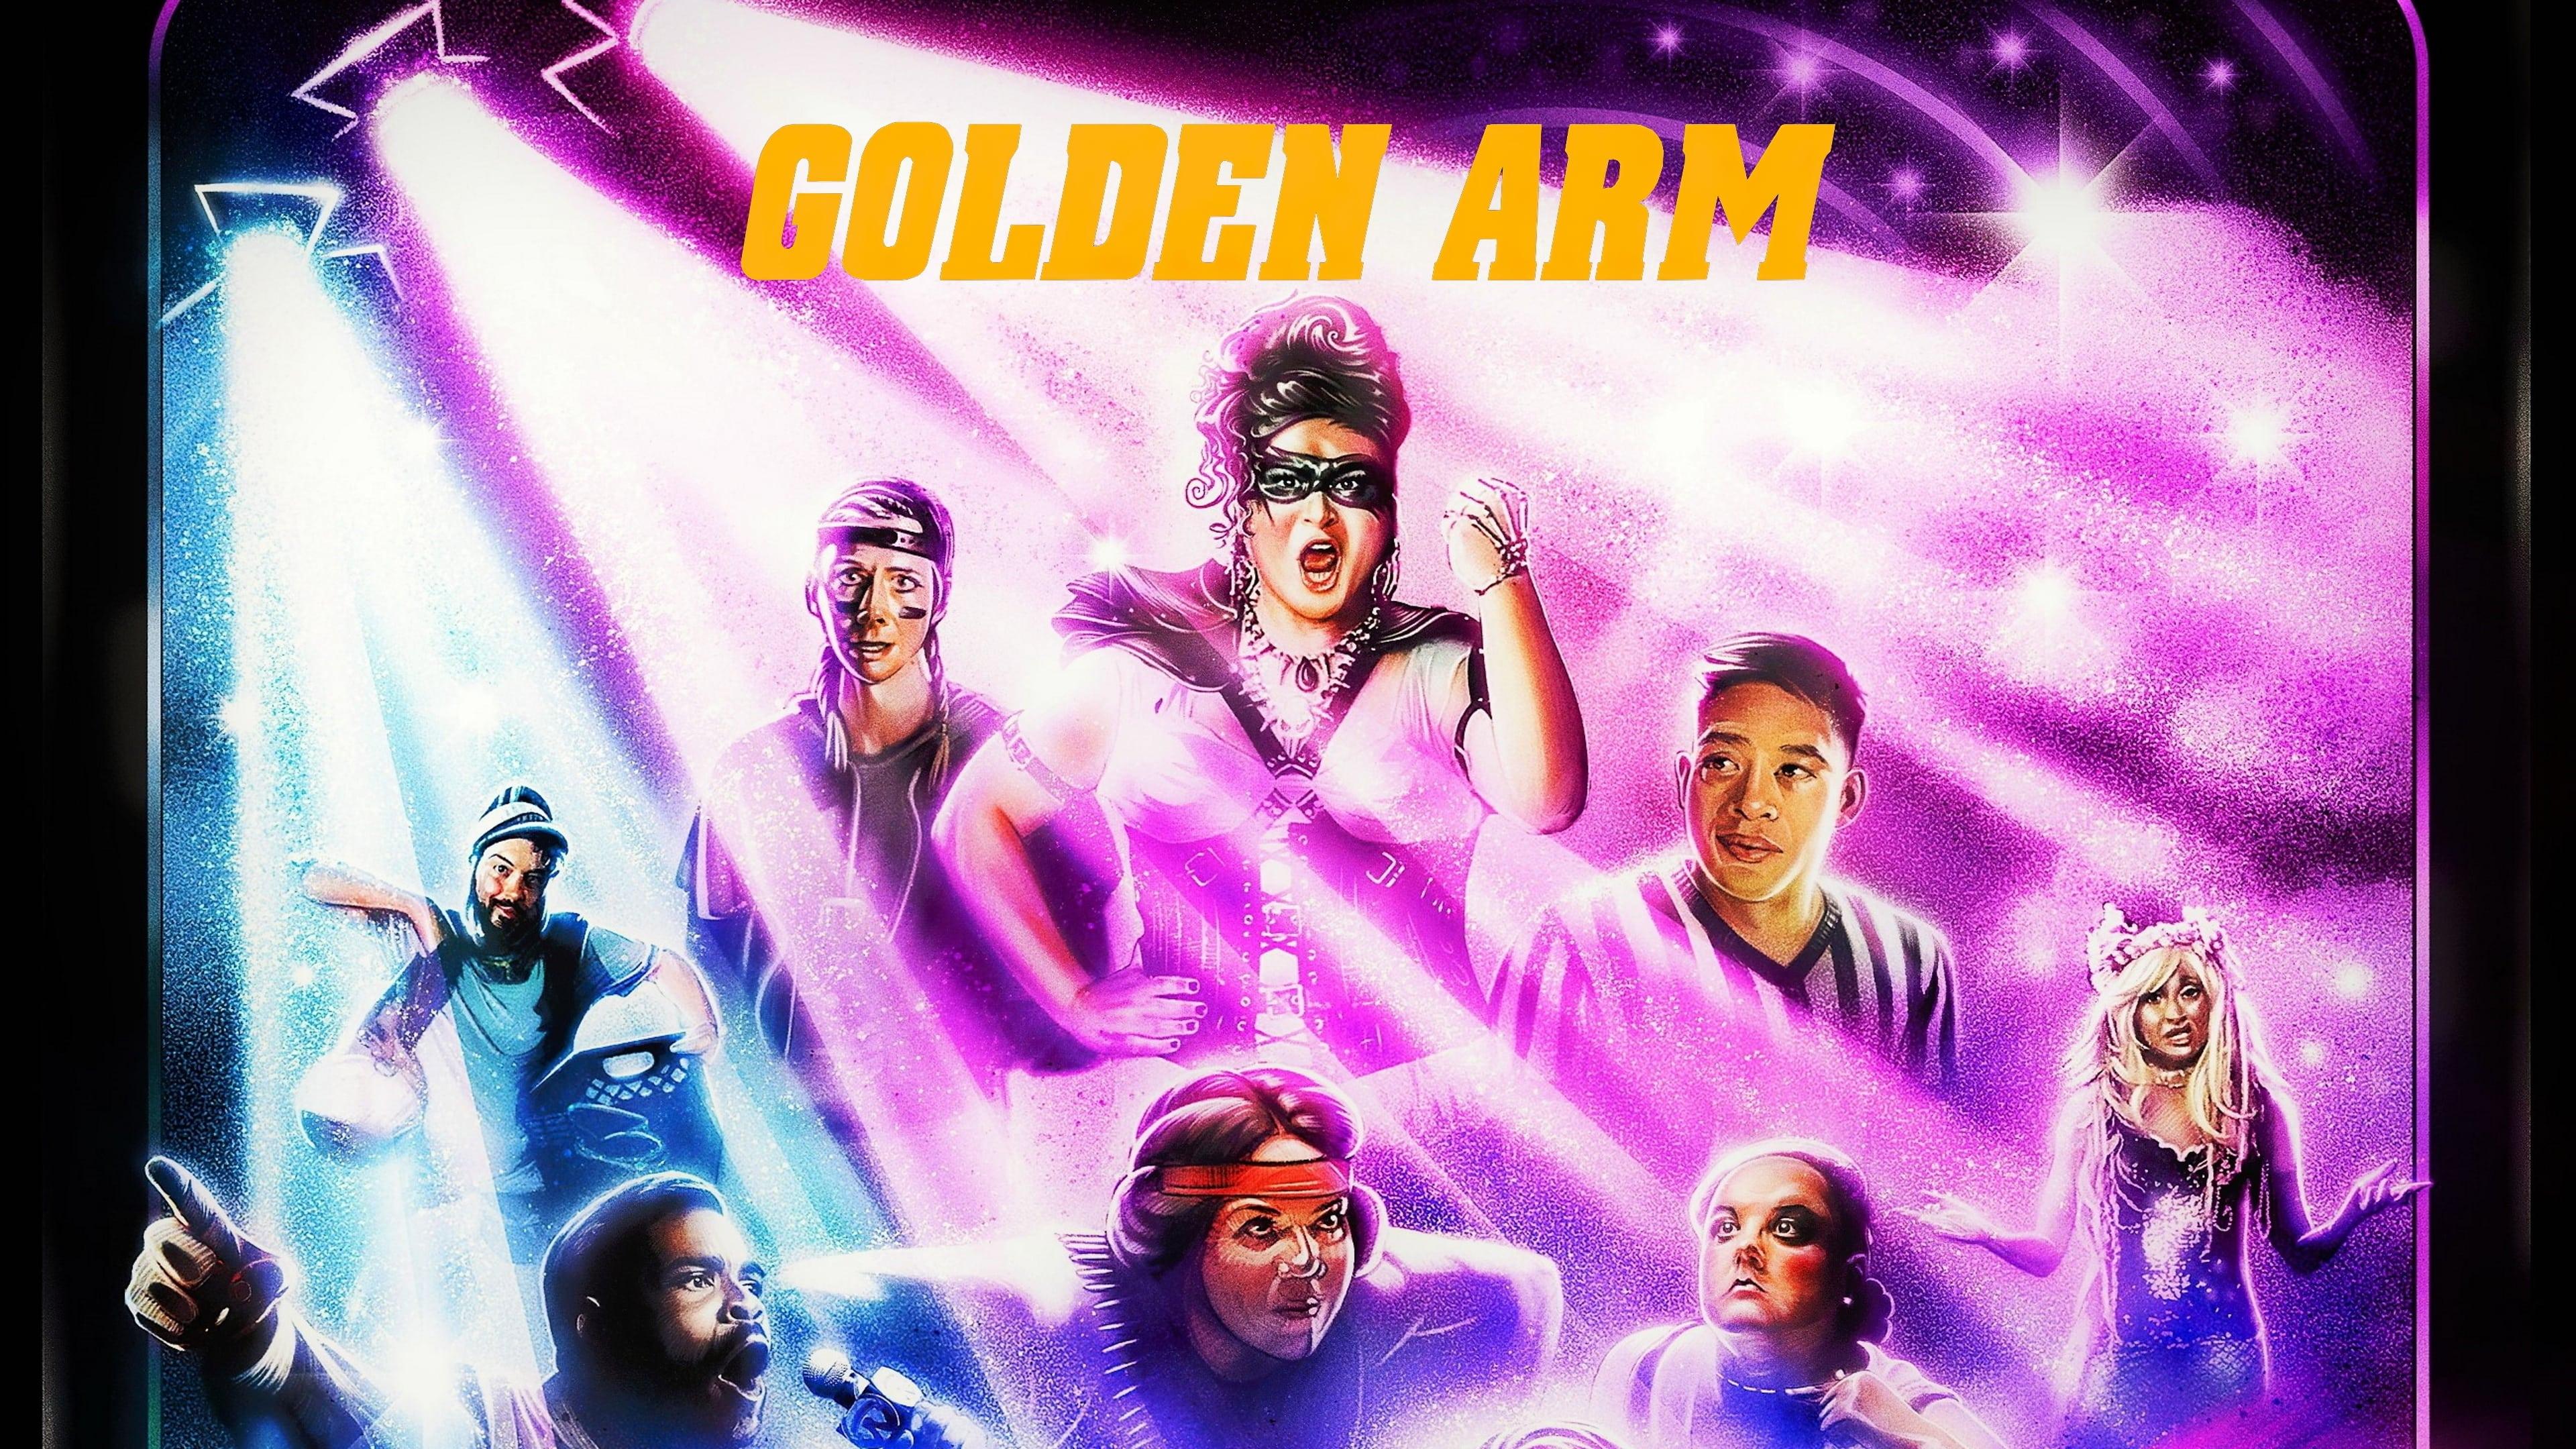 Golden Arm